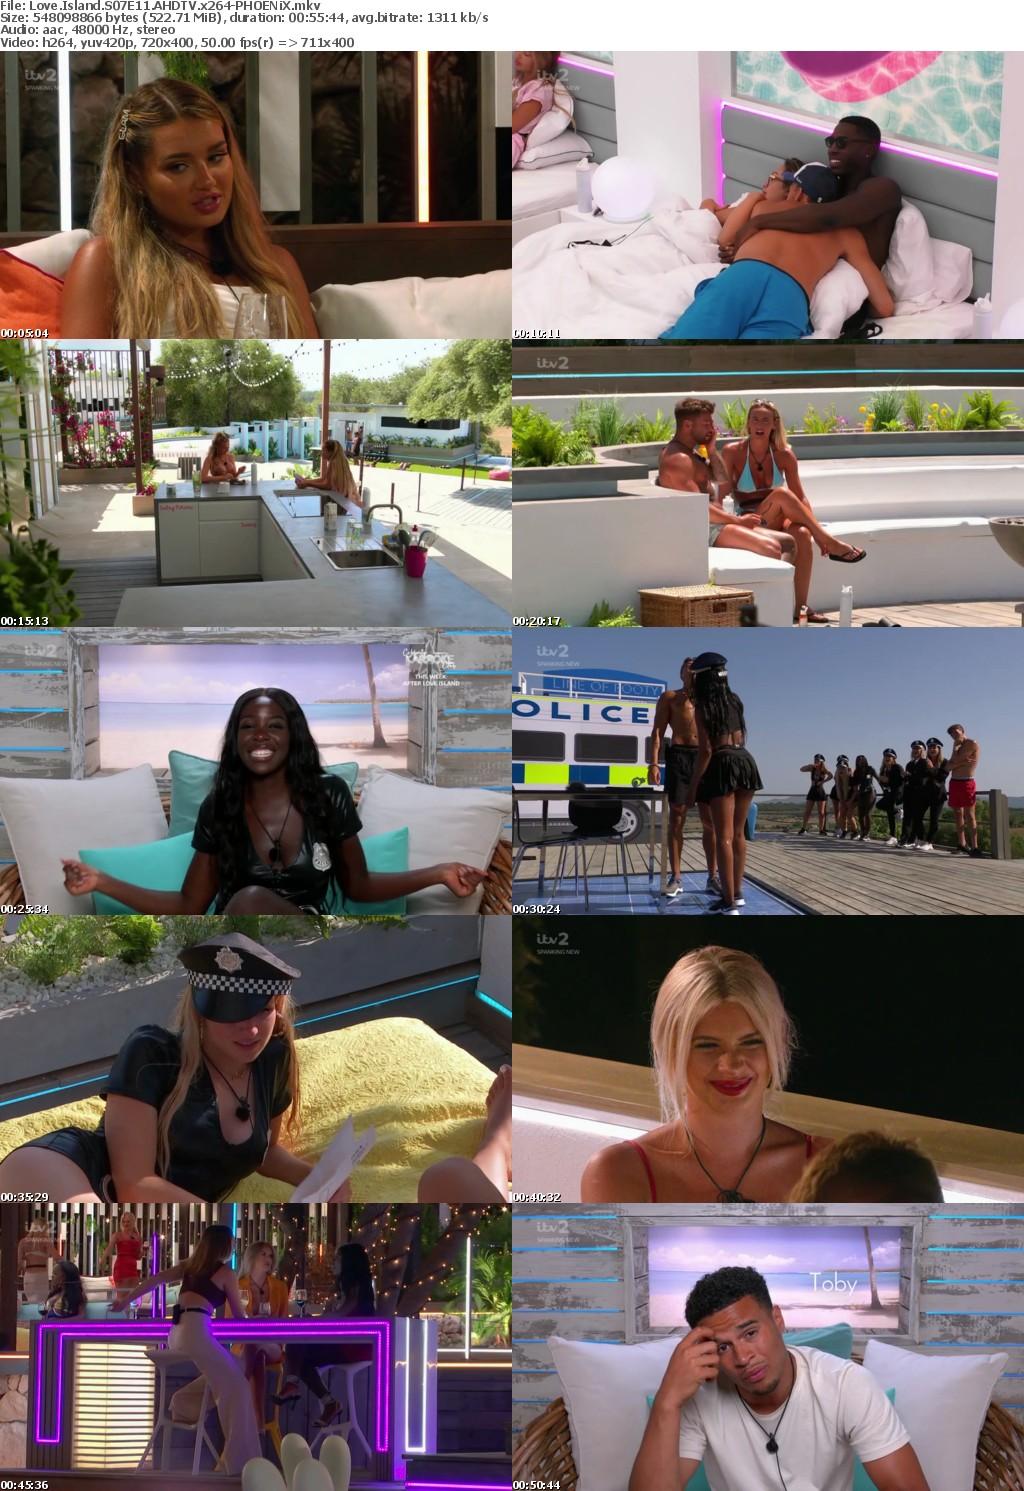 Love Island S07E11 AHDTV x264-PHOENiX